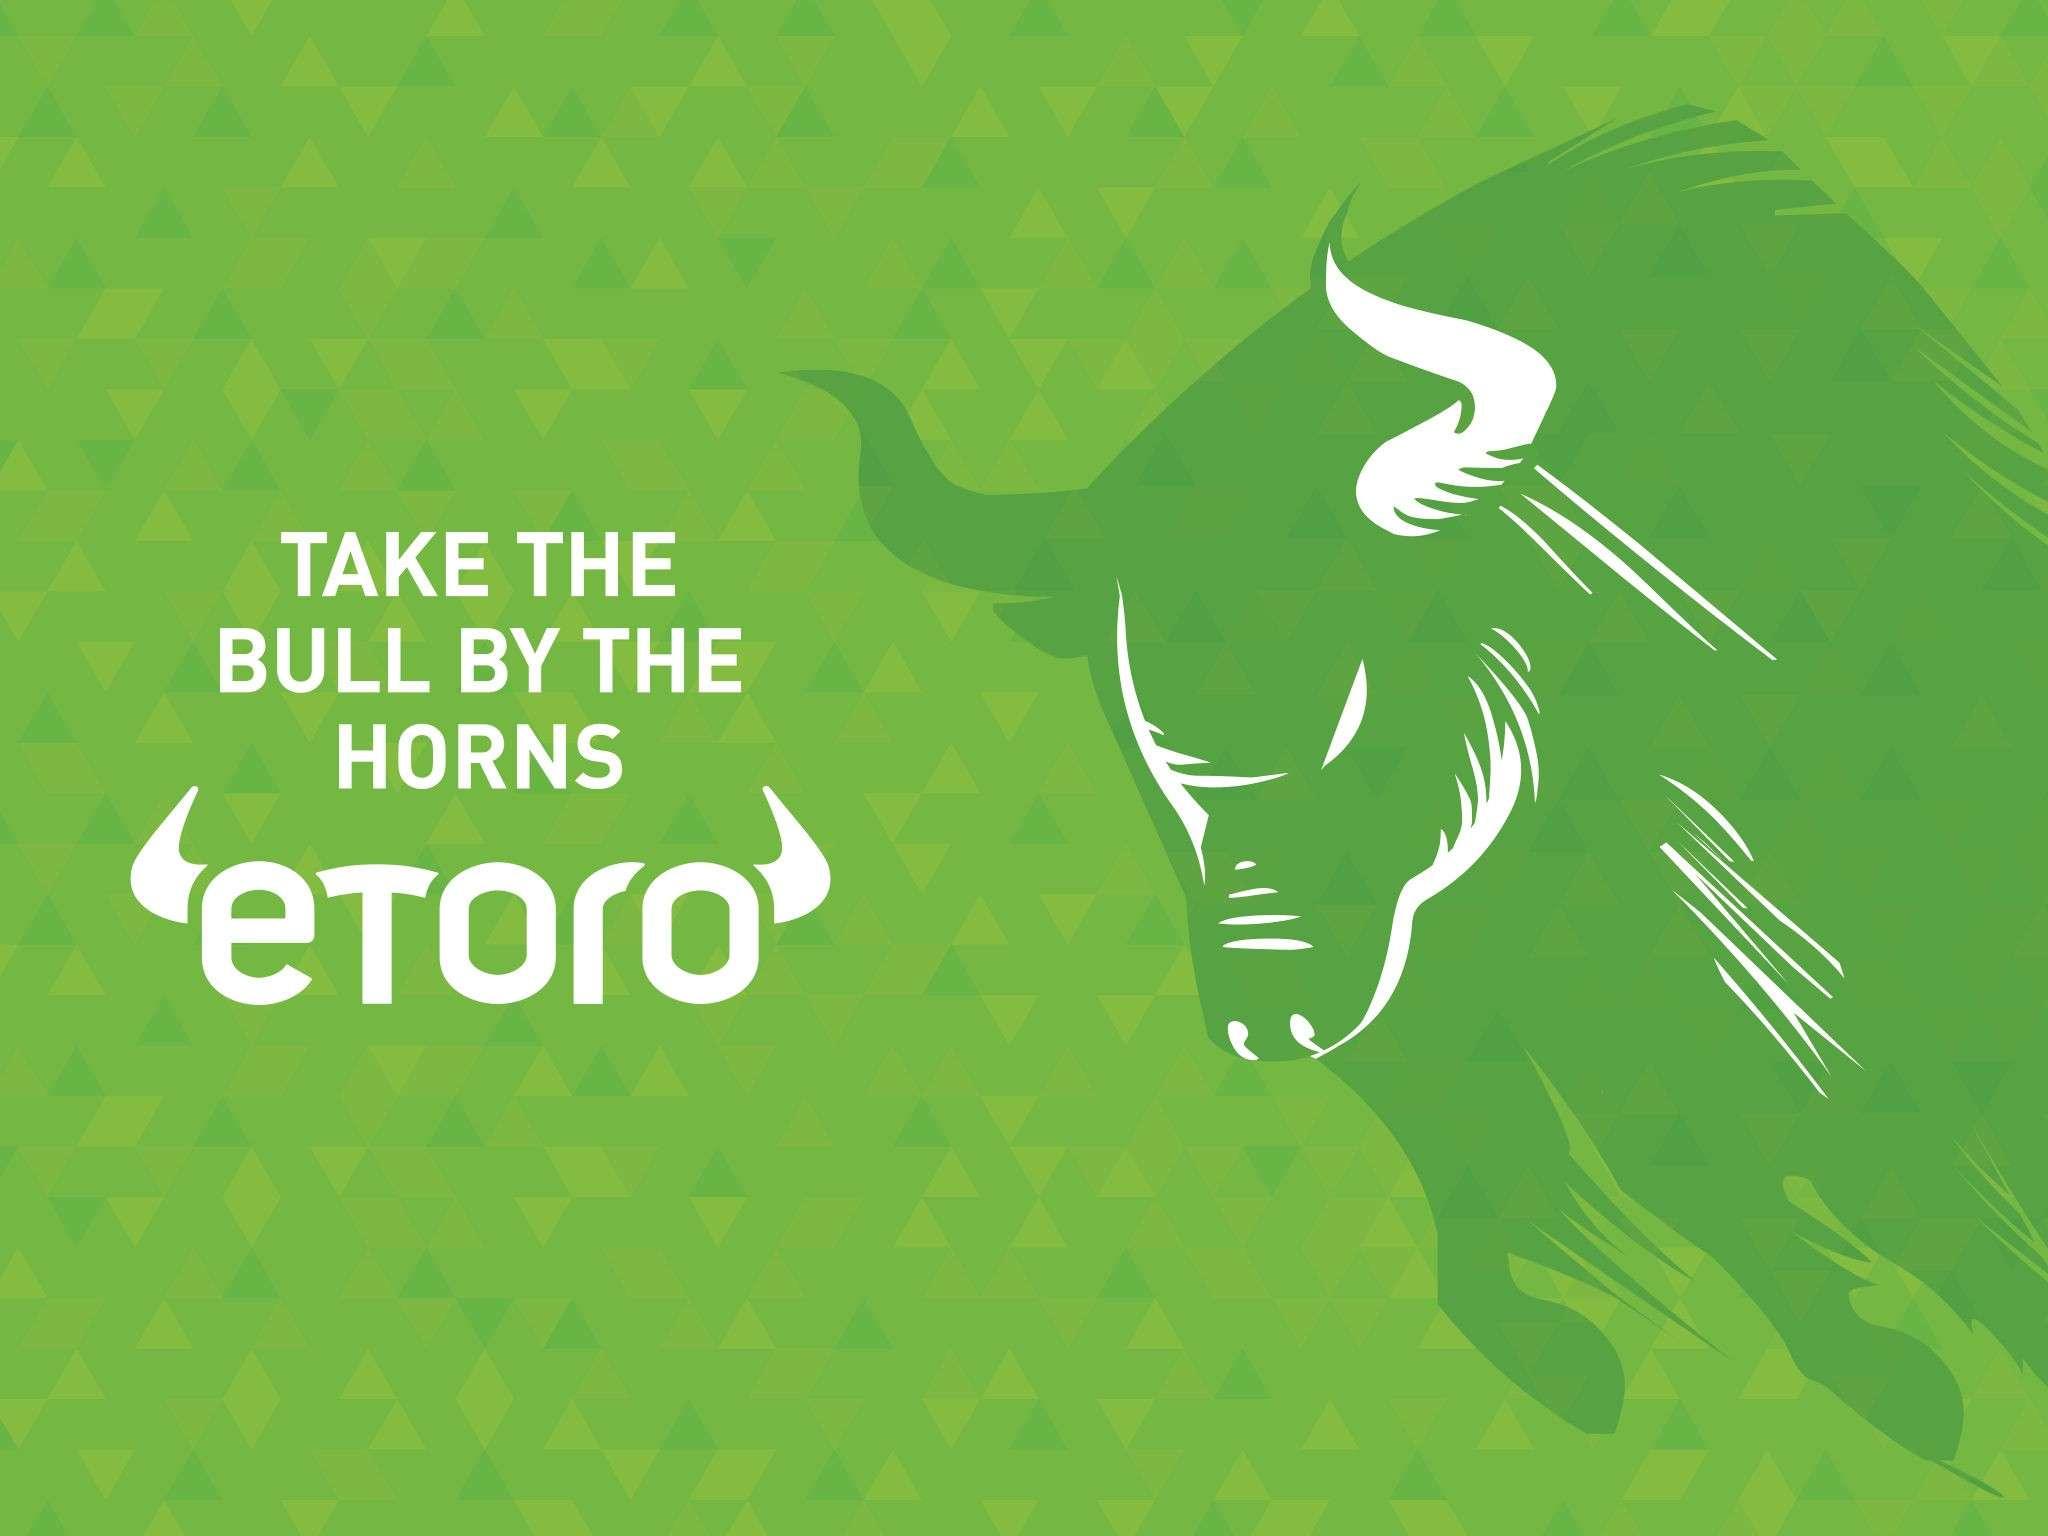 eToro review - take the bull by the horns